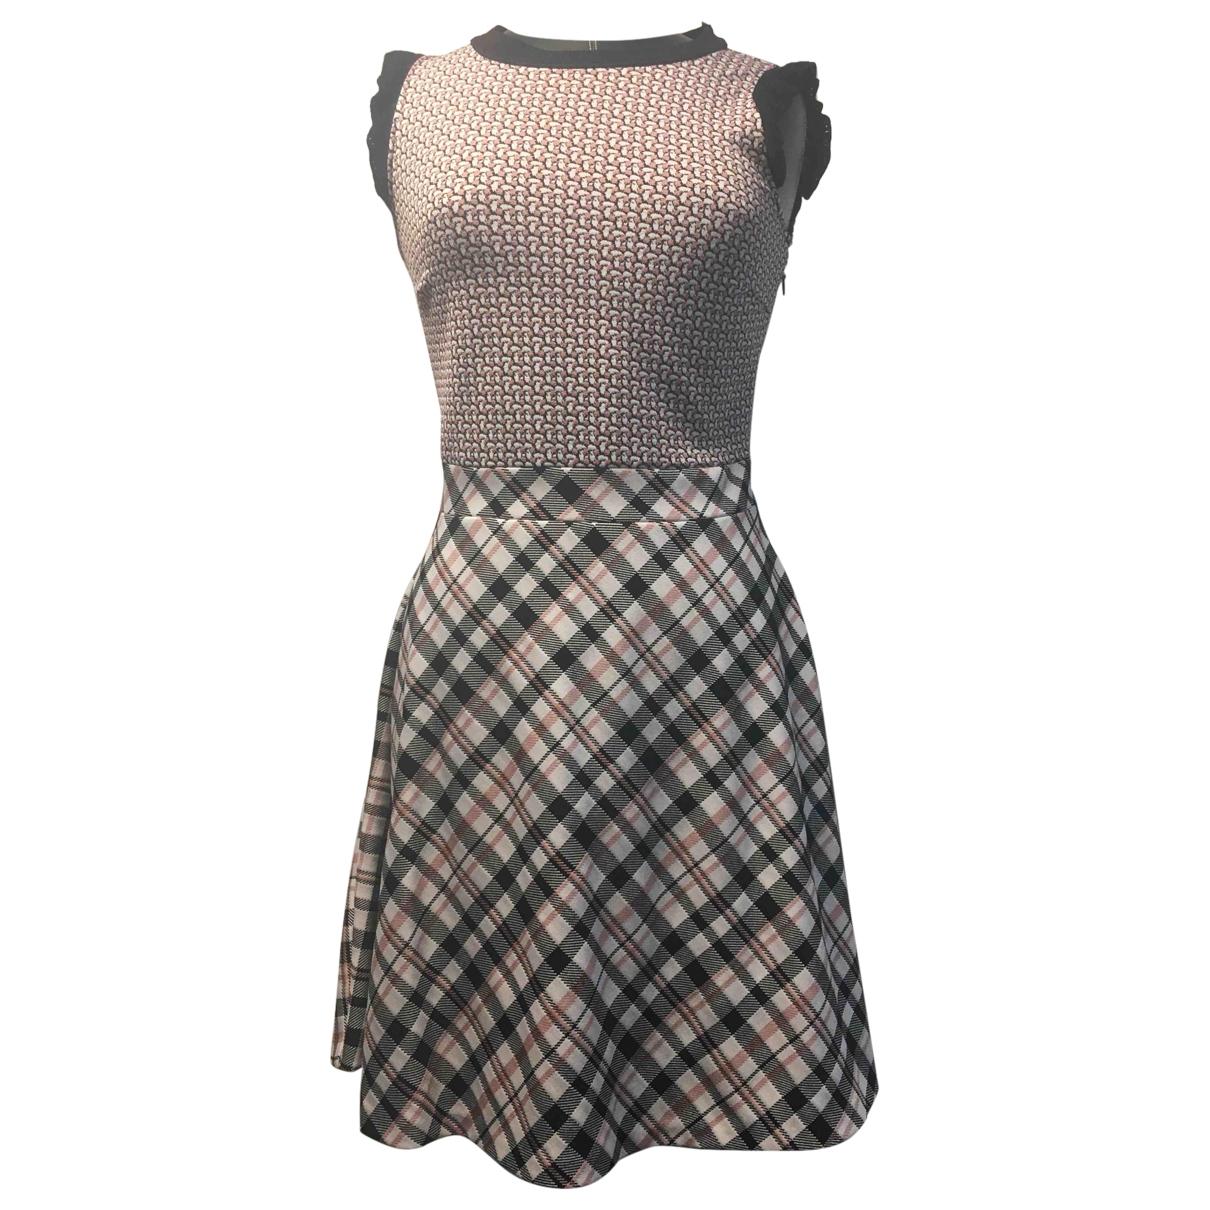 Pinko \N Multicolour Cotton - elasthane dress for Women 40 FR